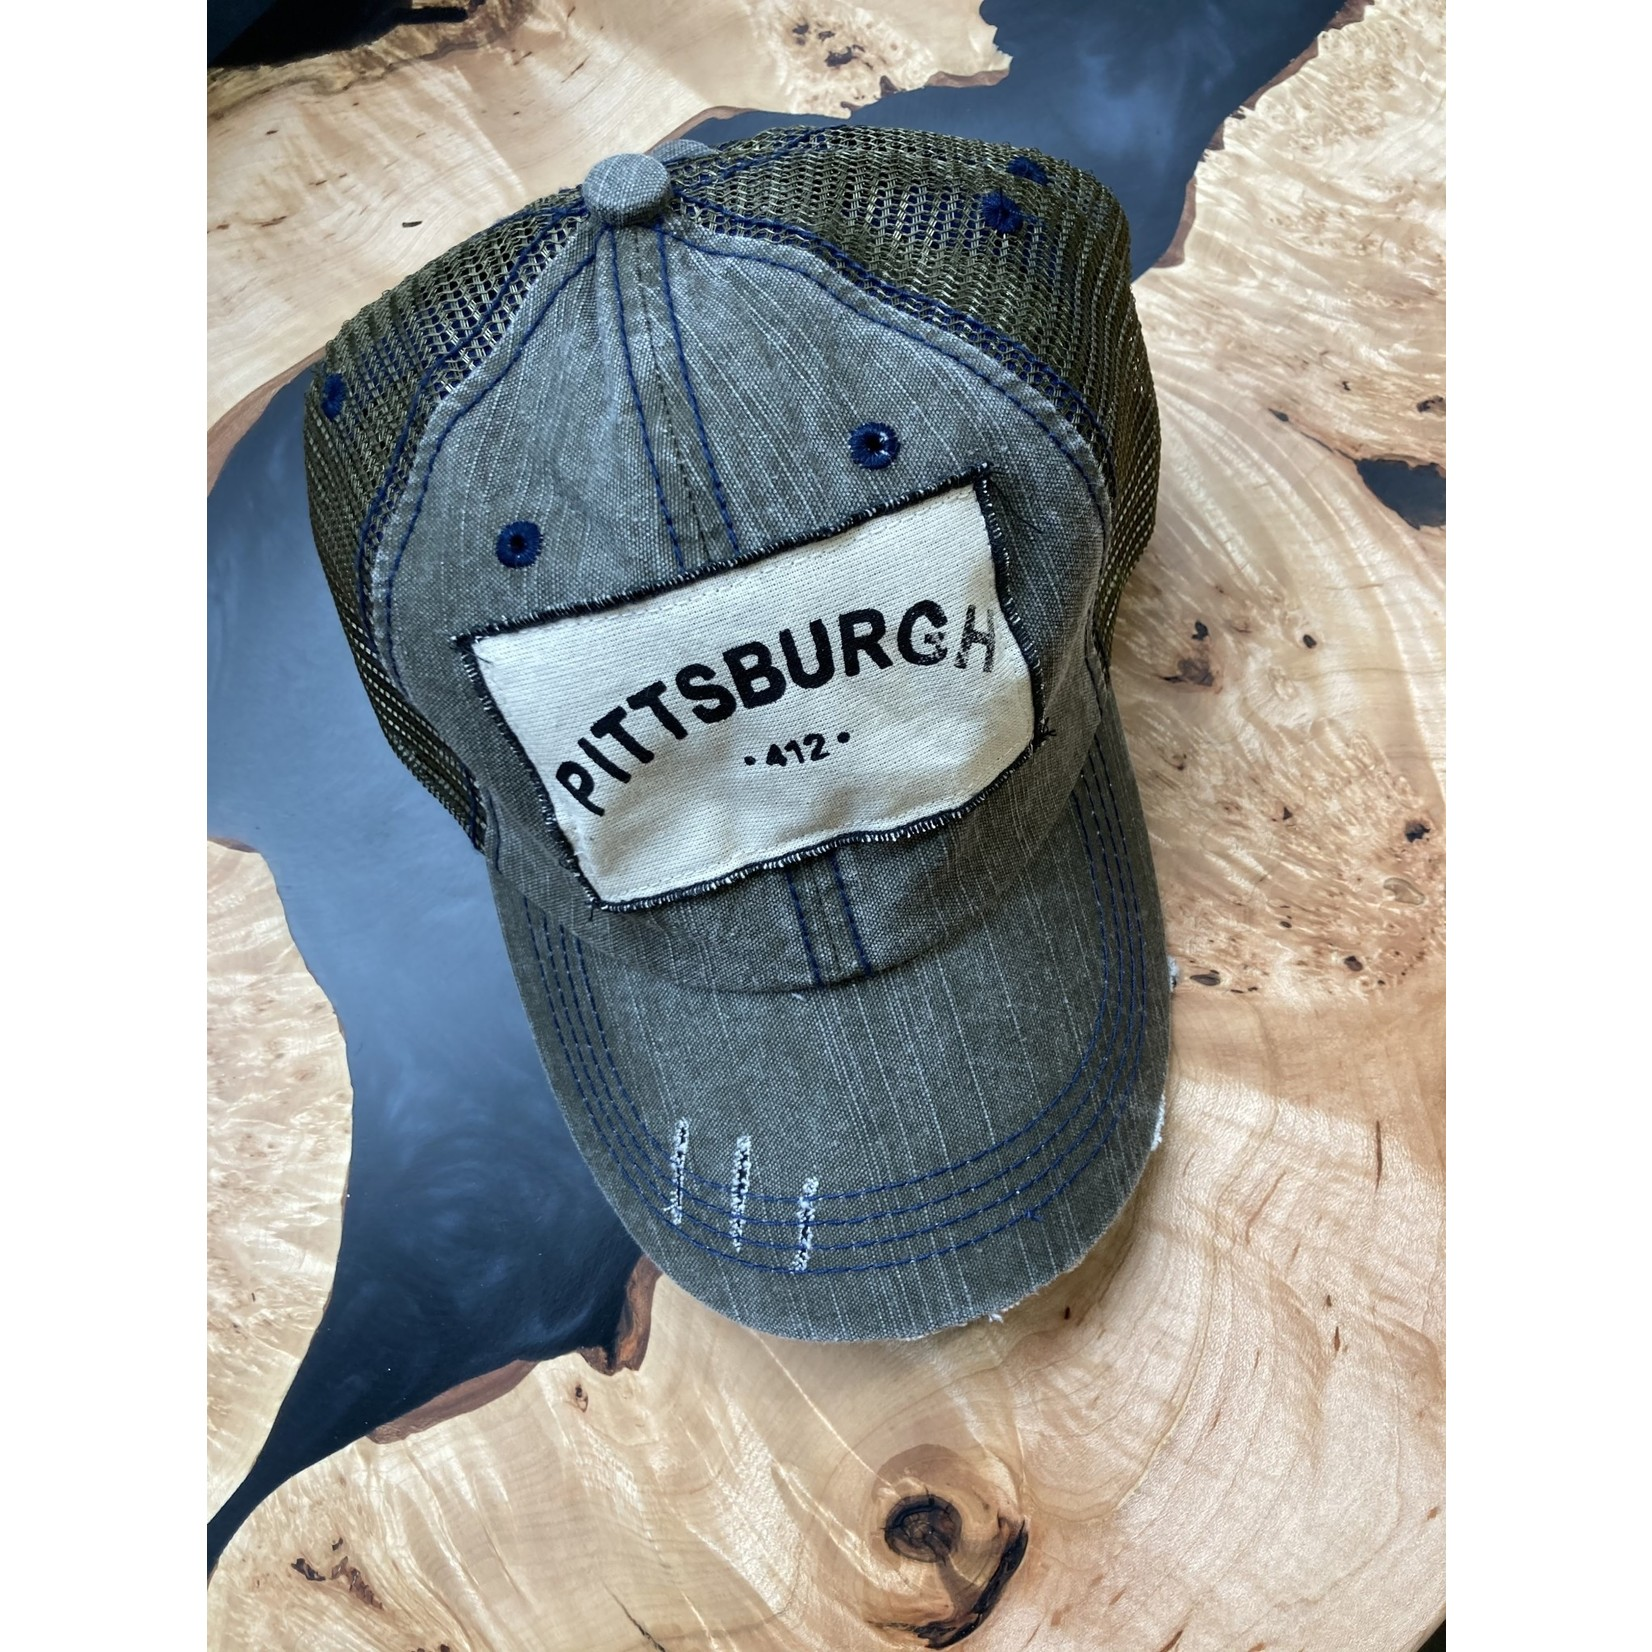 S & J Decor S & J Decor | Pittsburgh Trucker Hat - Charcoal w/green mesh